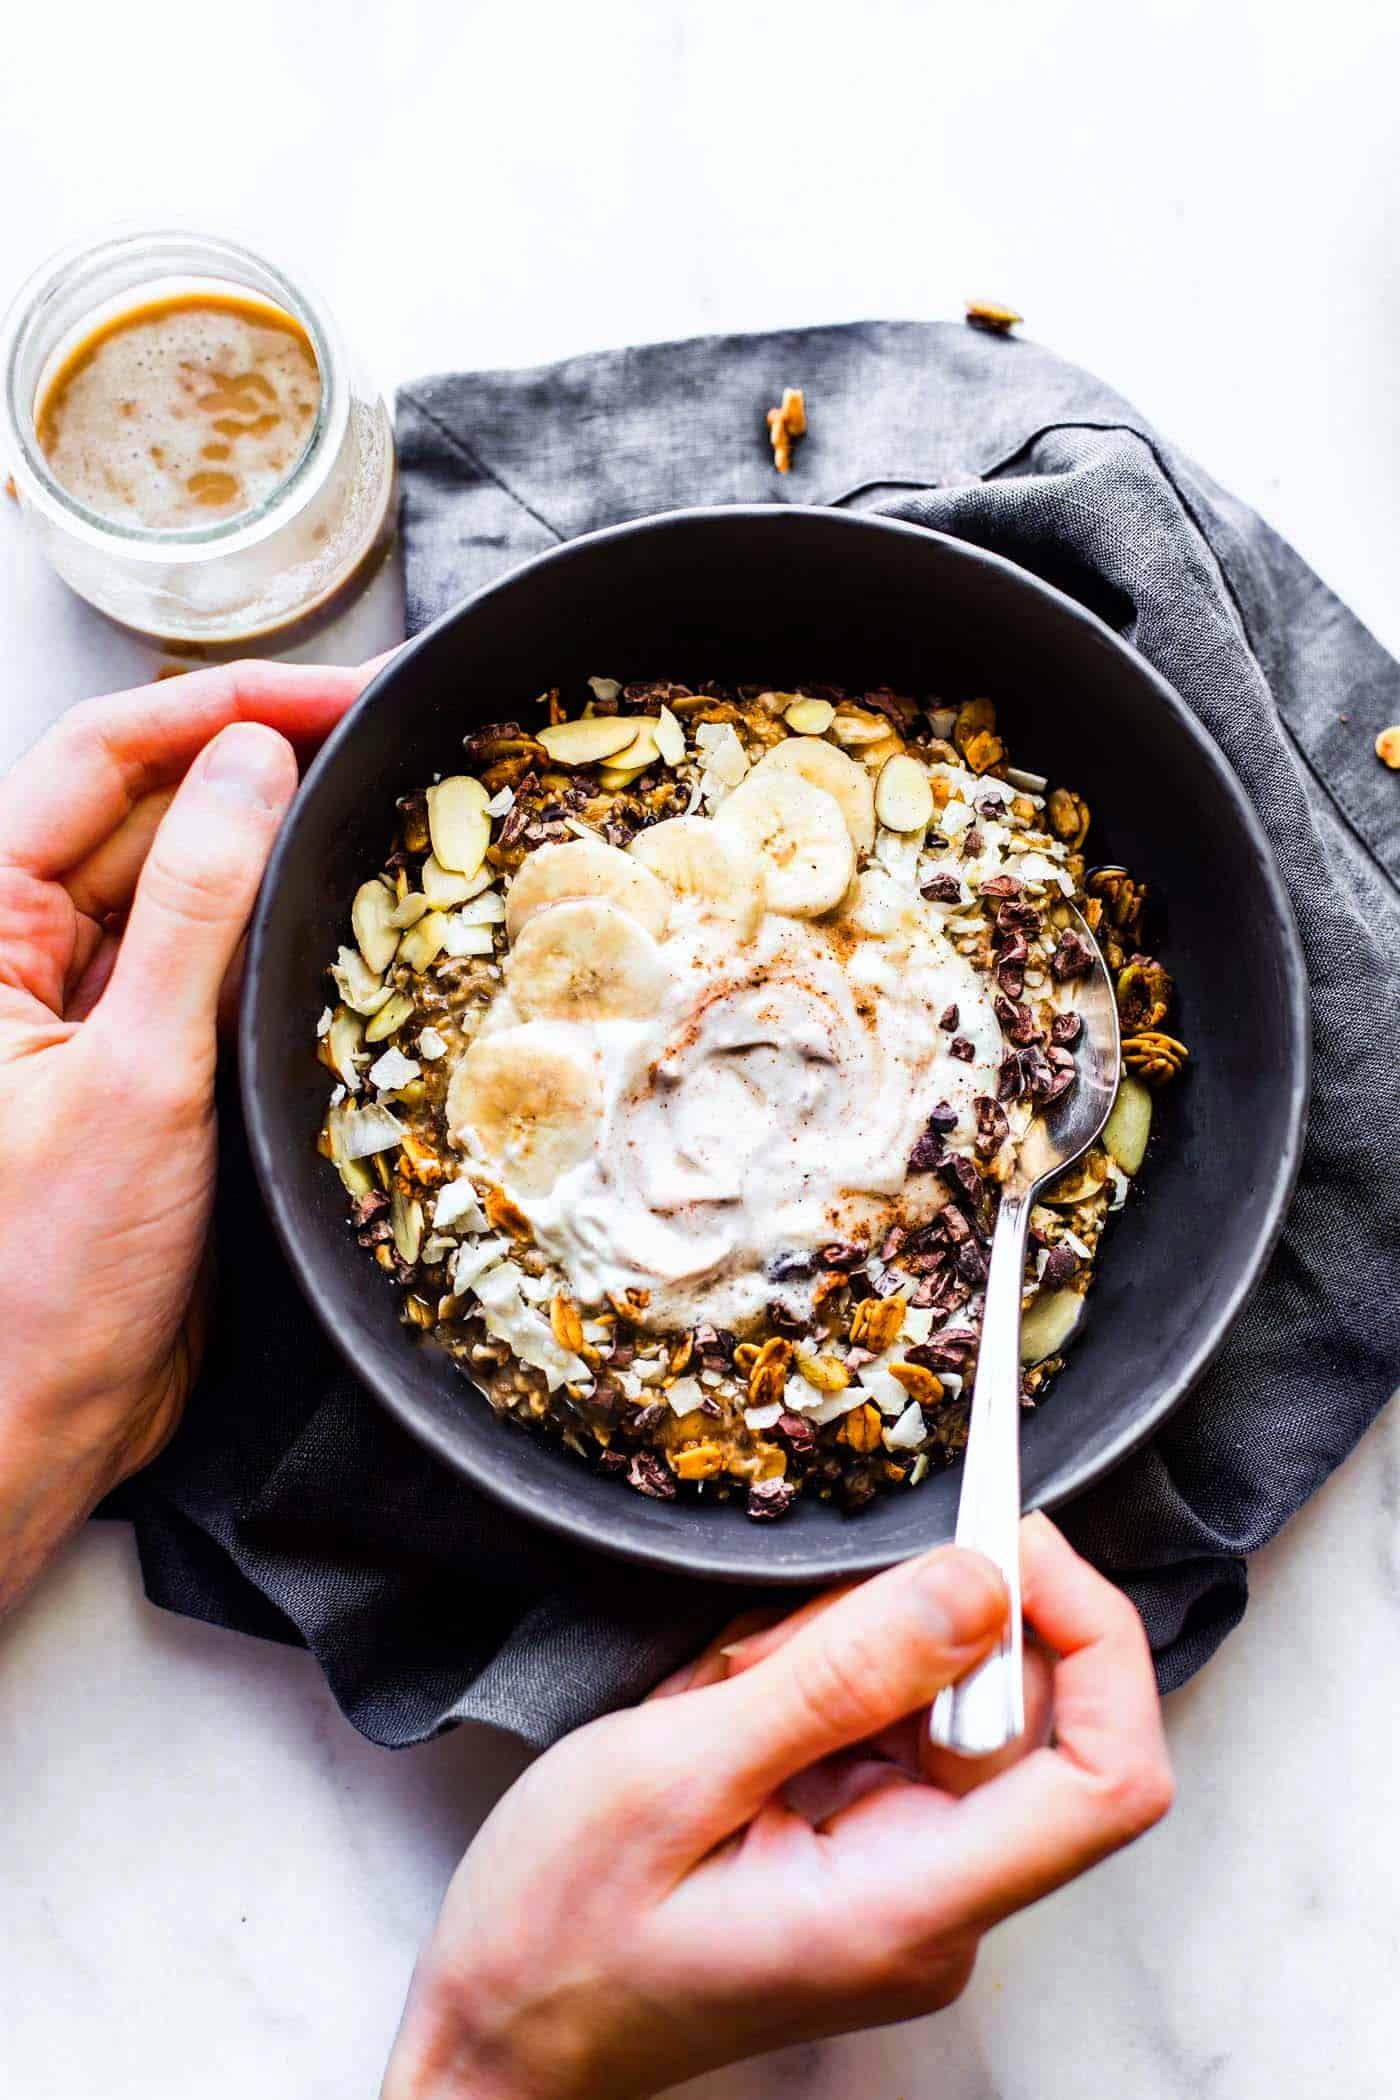 Detox morning bowl